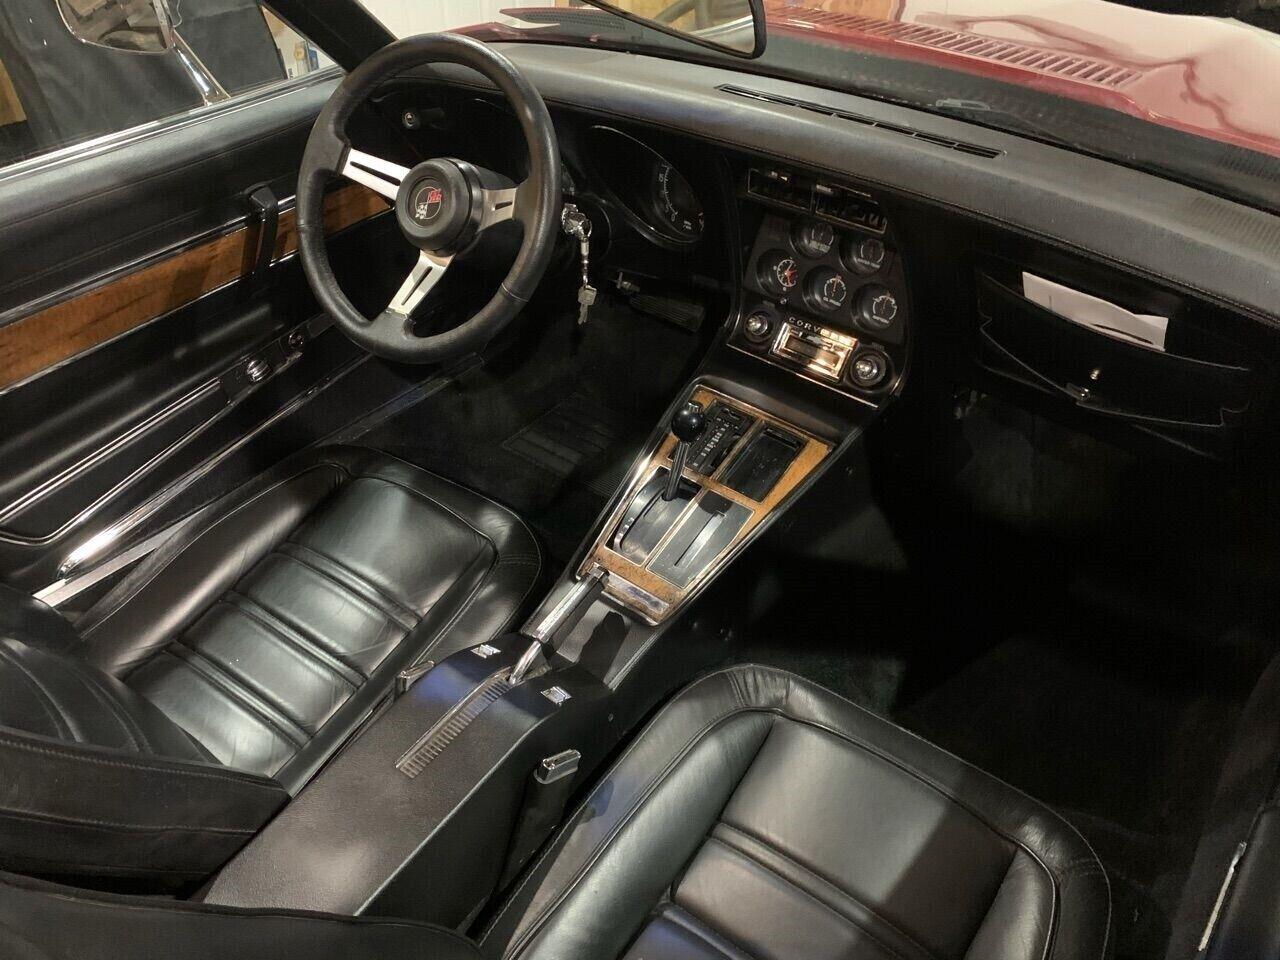 1976 Red Chevrolet Corvette Stingray    C3 Corvette Photo 2